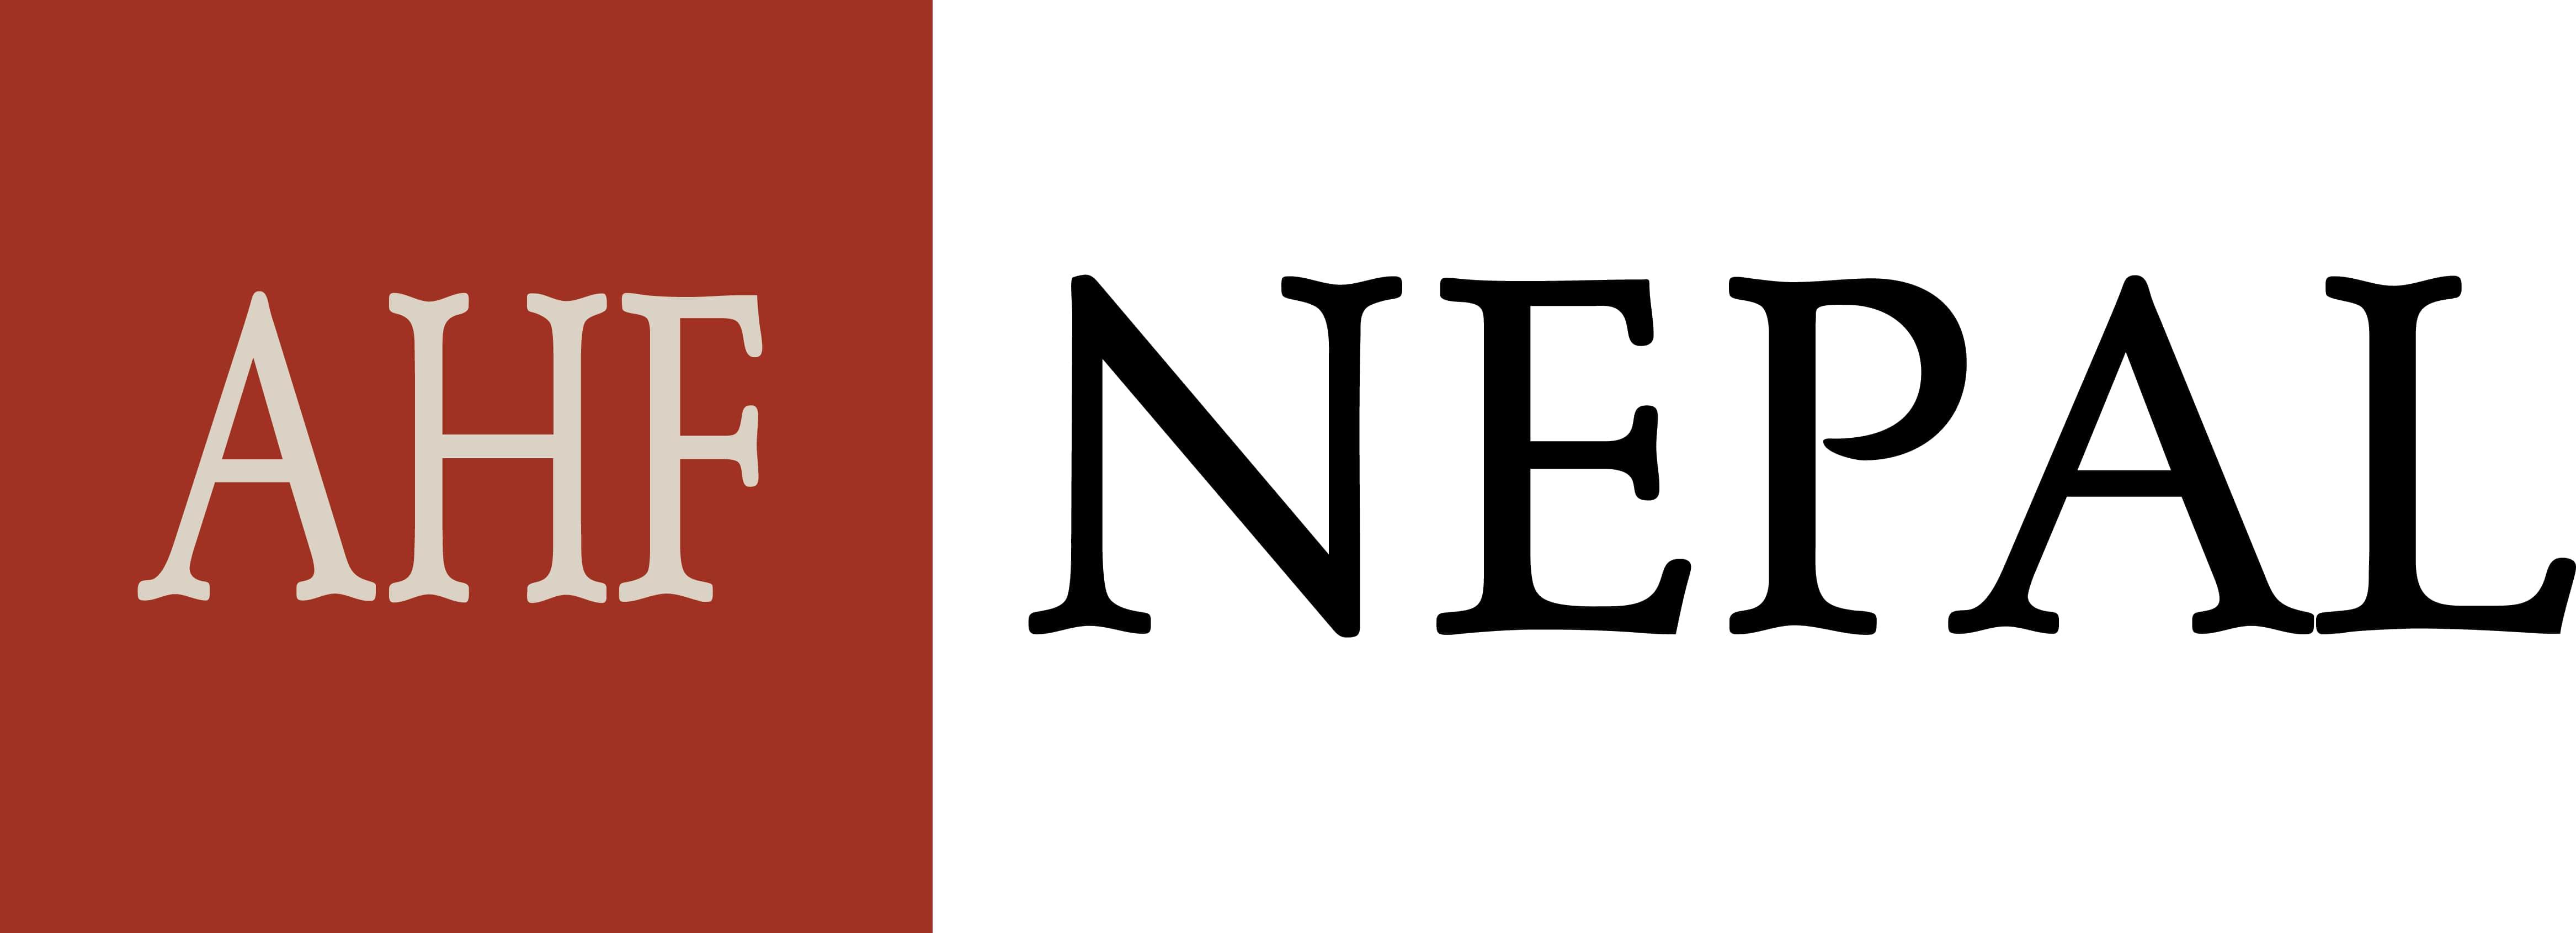 Association of International NGOs in Nepal (AIN)